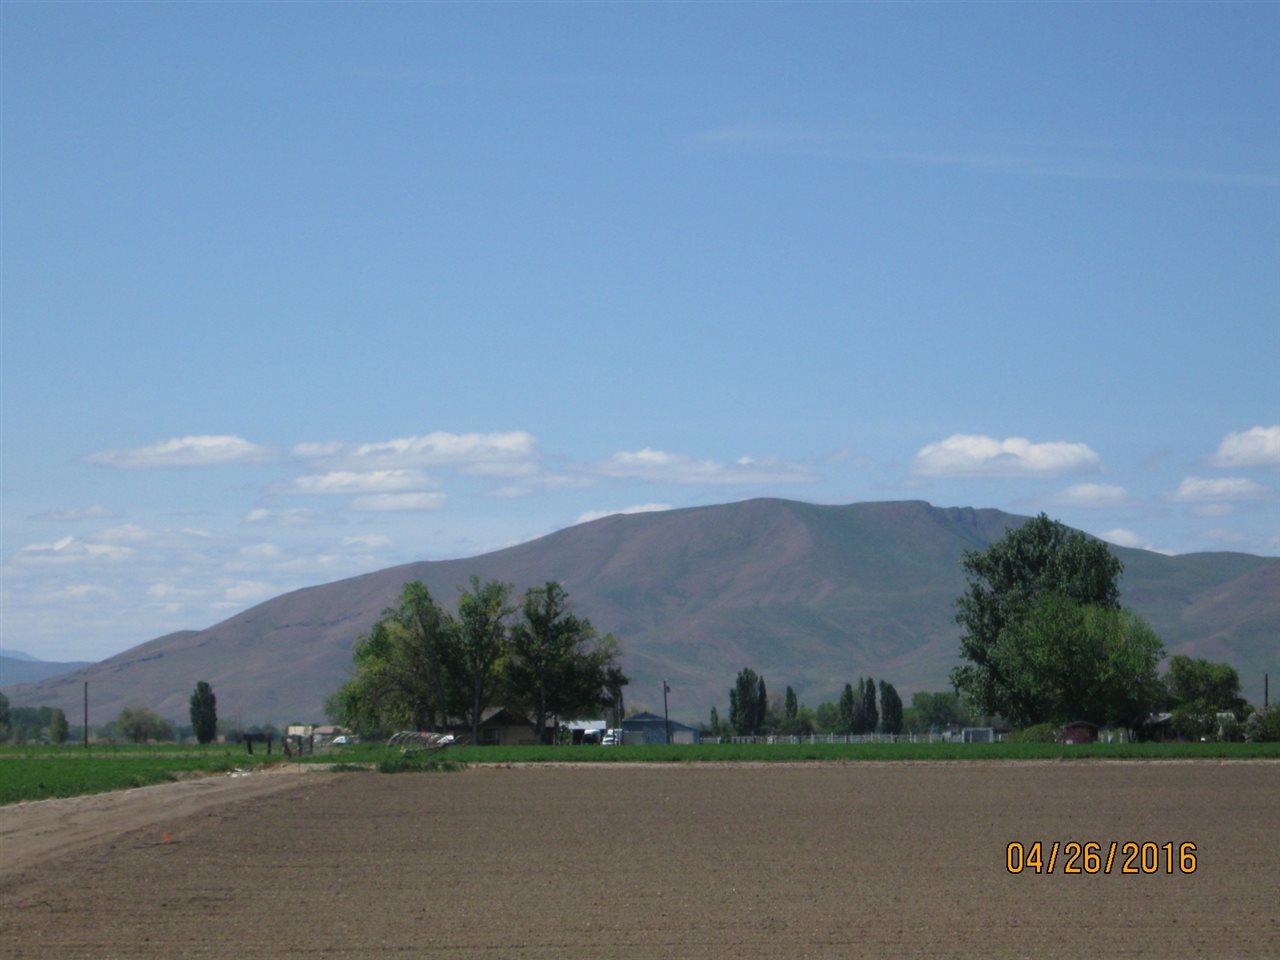 TBD Indianhead Road,Weiser,Idaho 83672,Land,TBD Indianhead Road,98609070